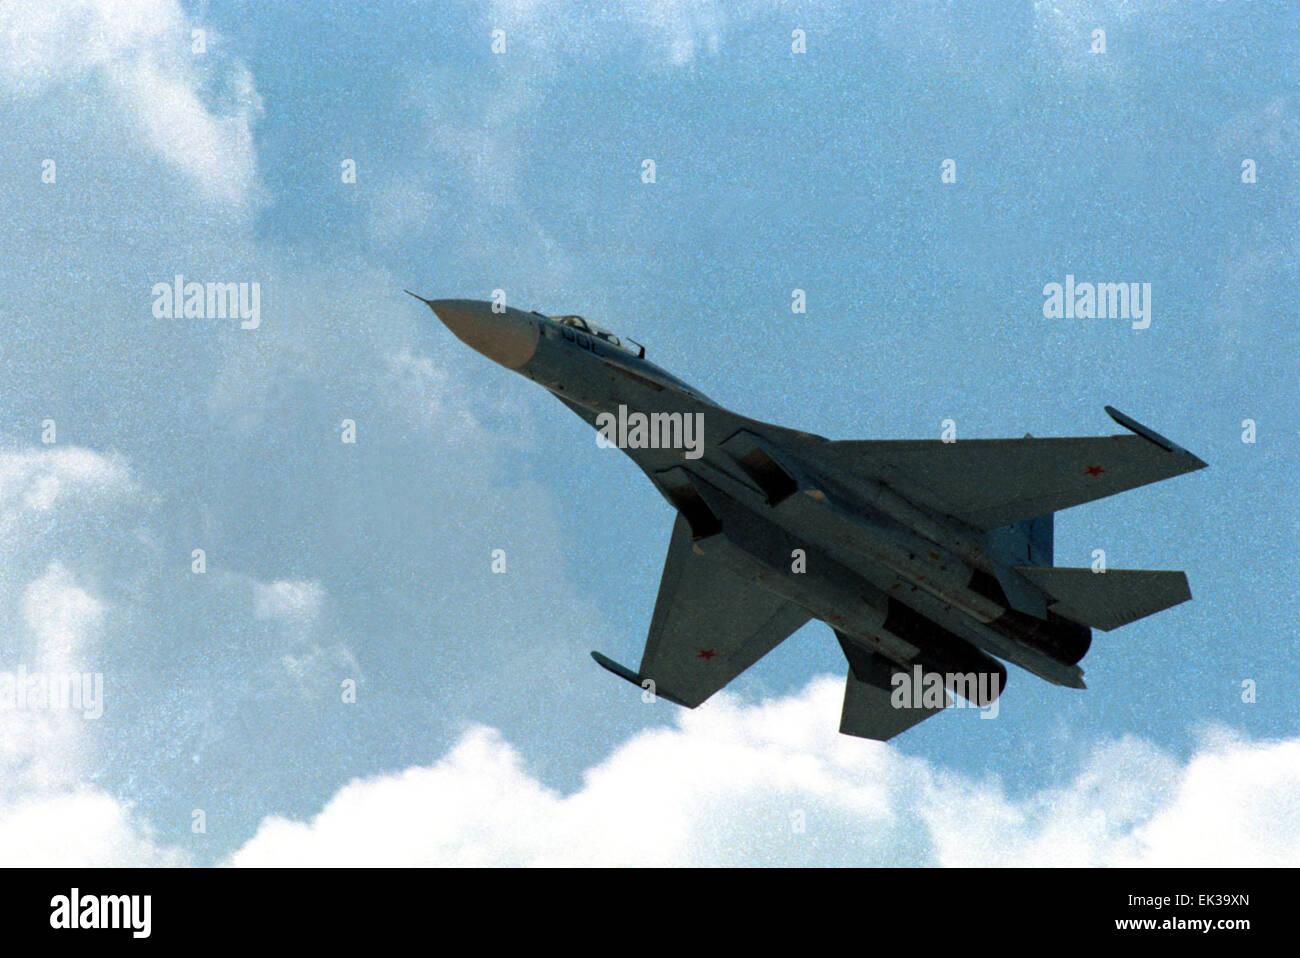 ZHUKOVSKY, RUSSIA. Sukhoi Su-27 (Flanker) jet fighter. - Stock Image